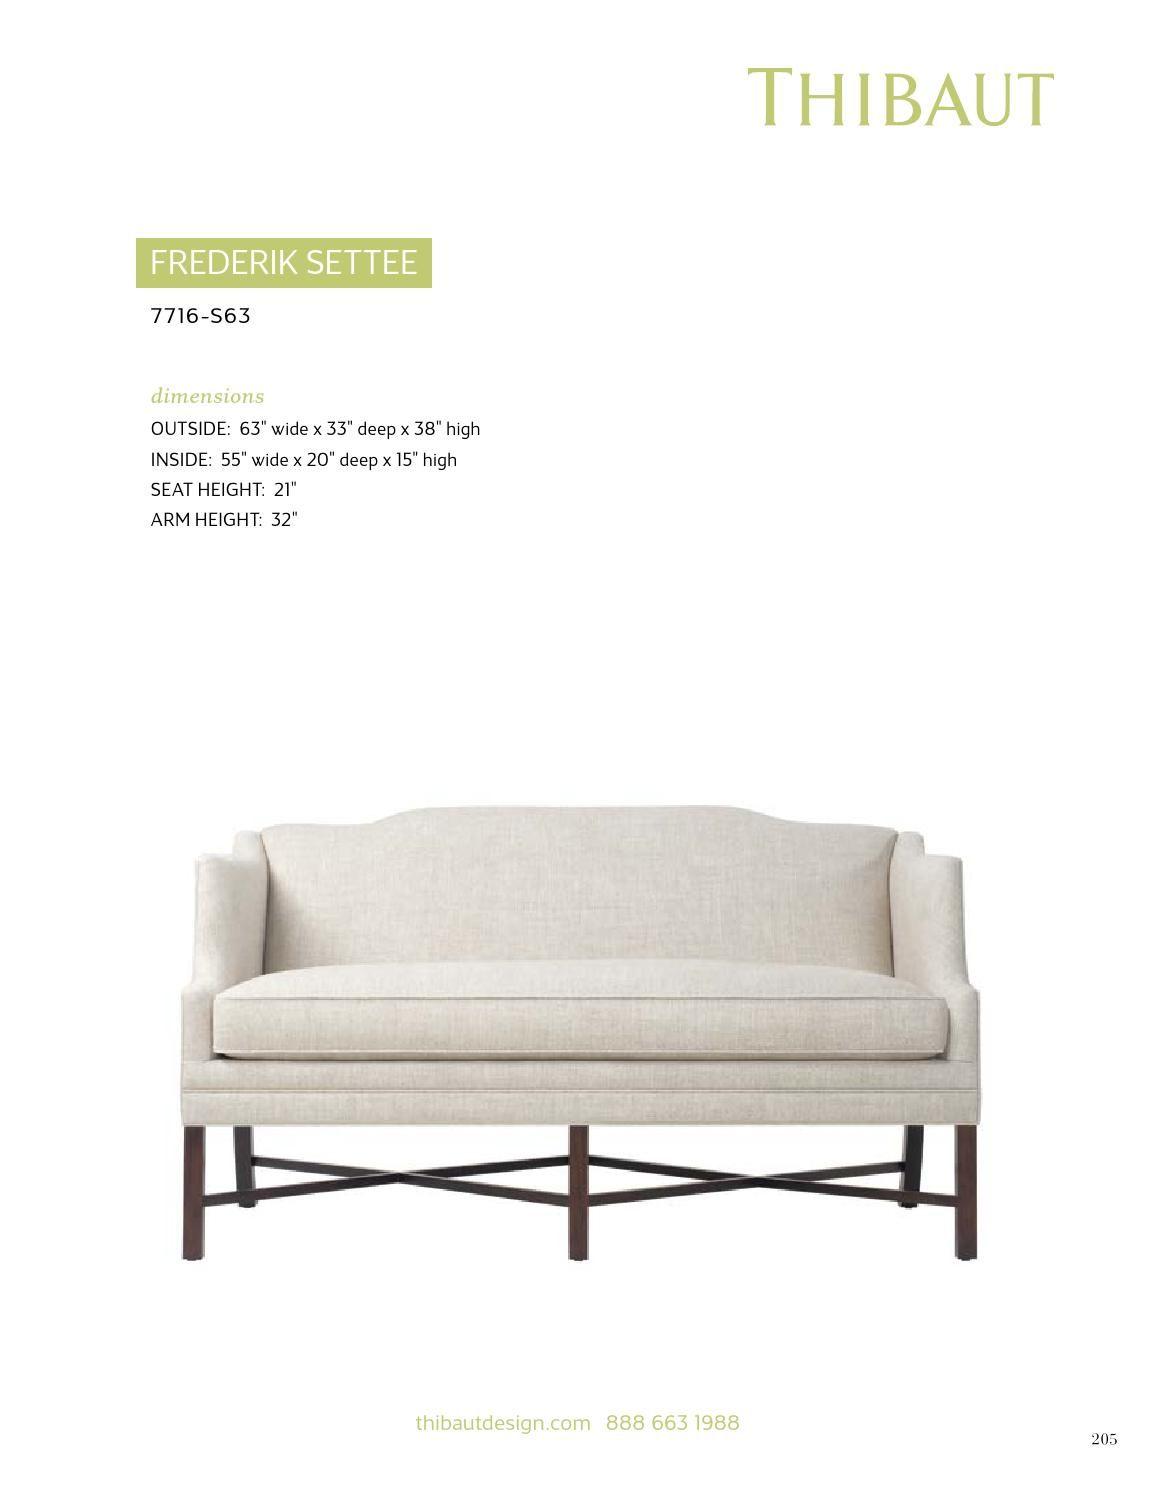 Thibaut Fine Furniture The Frederik Settee